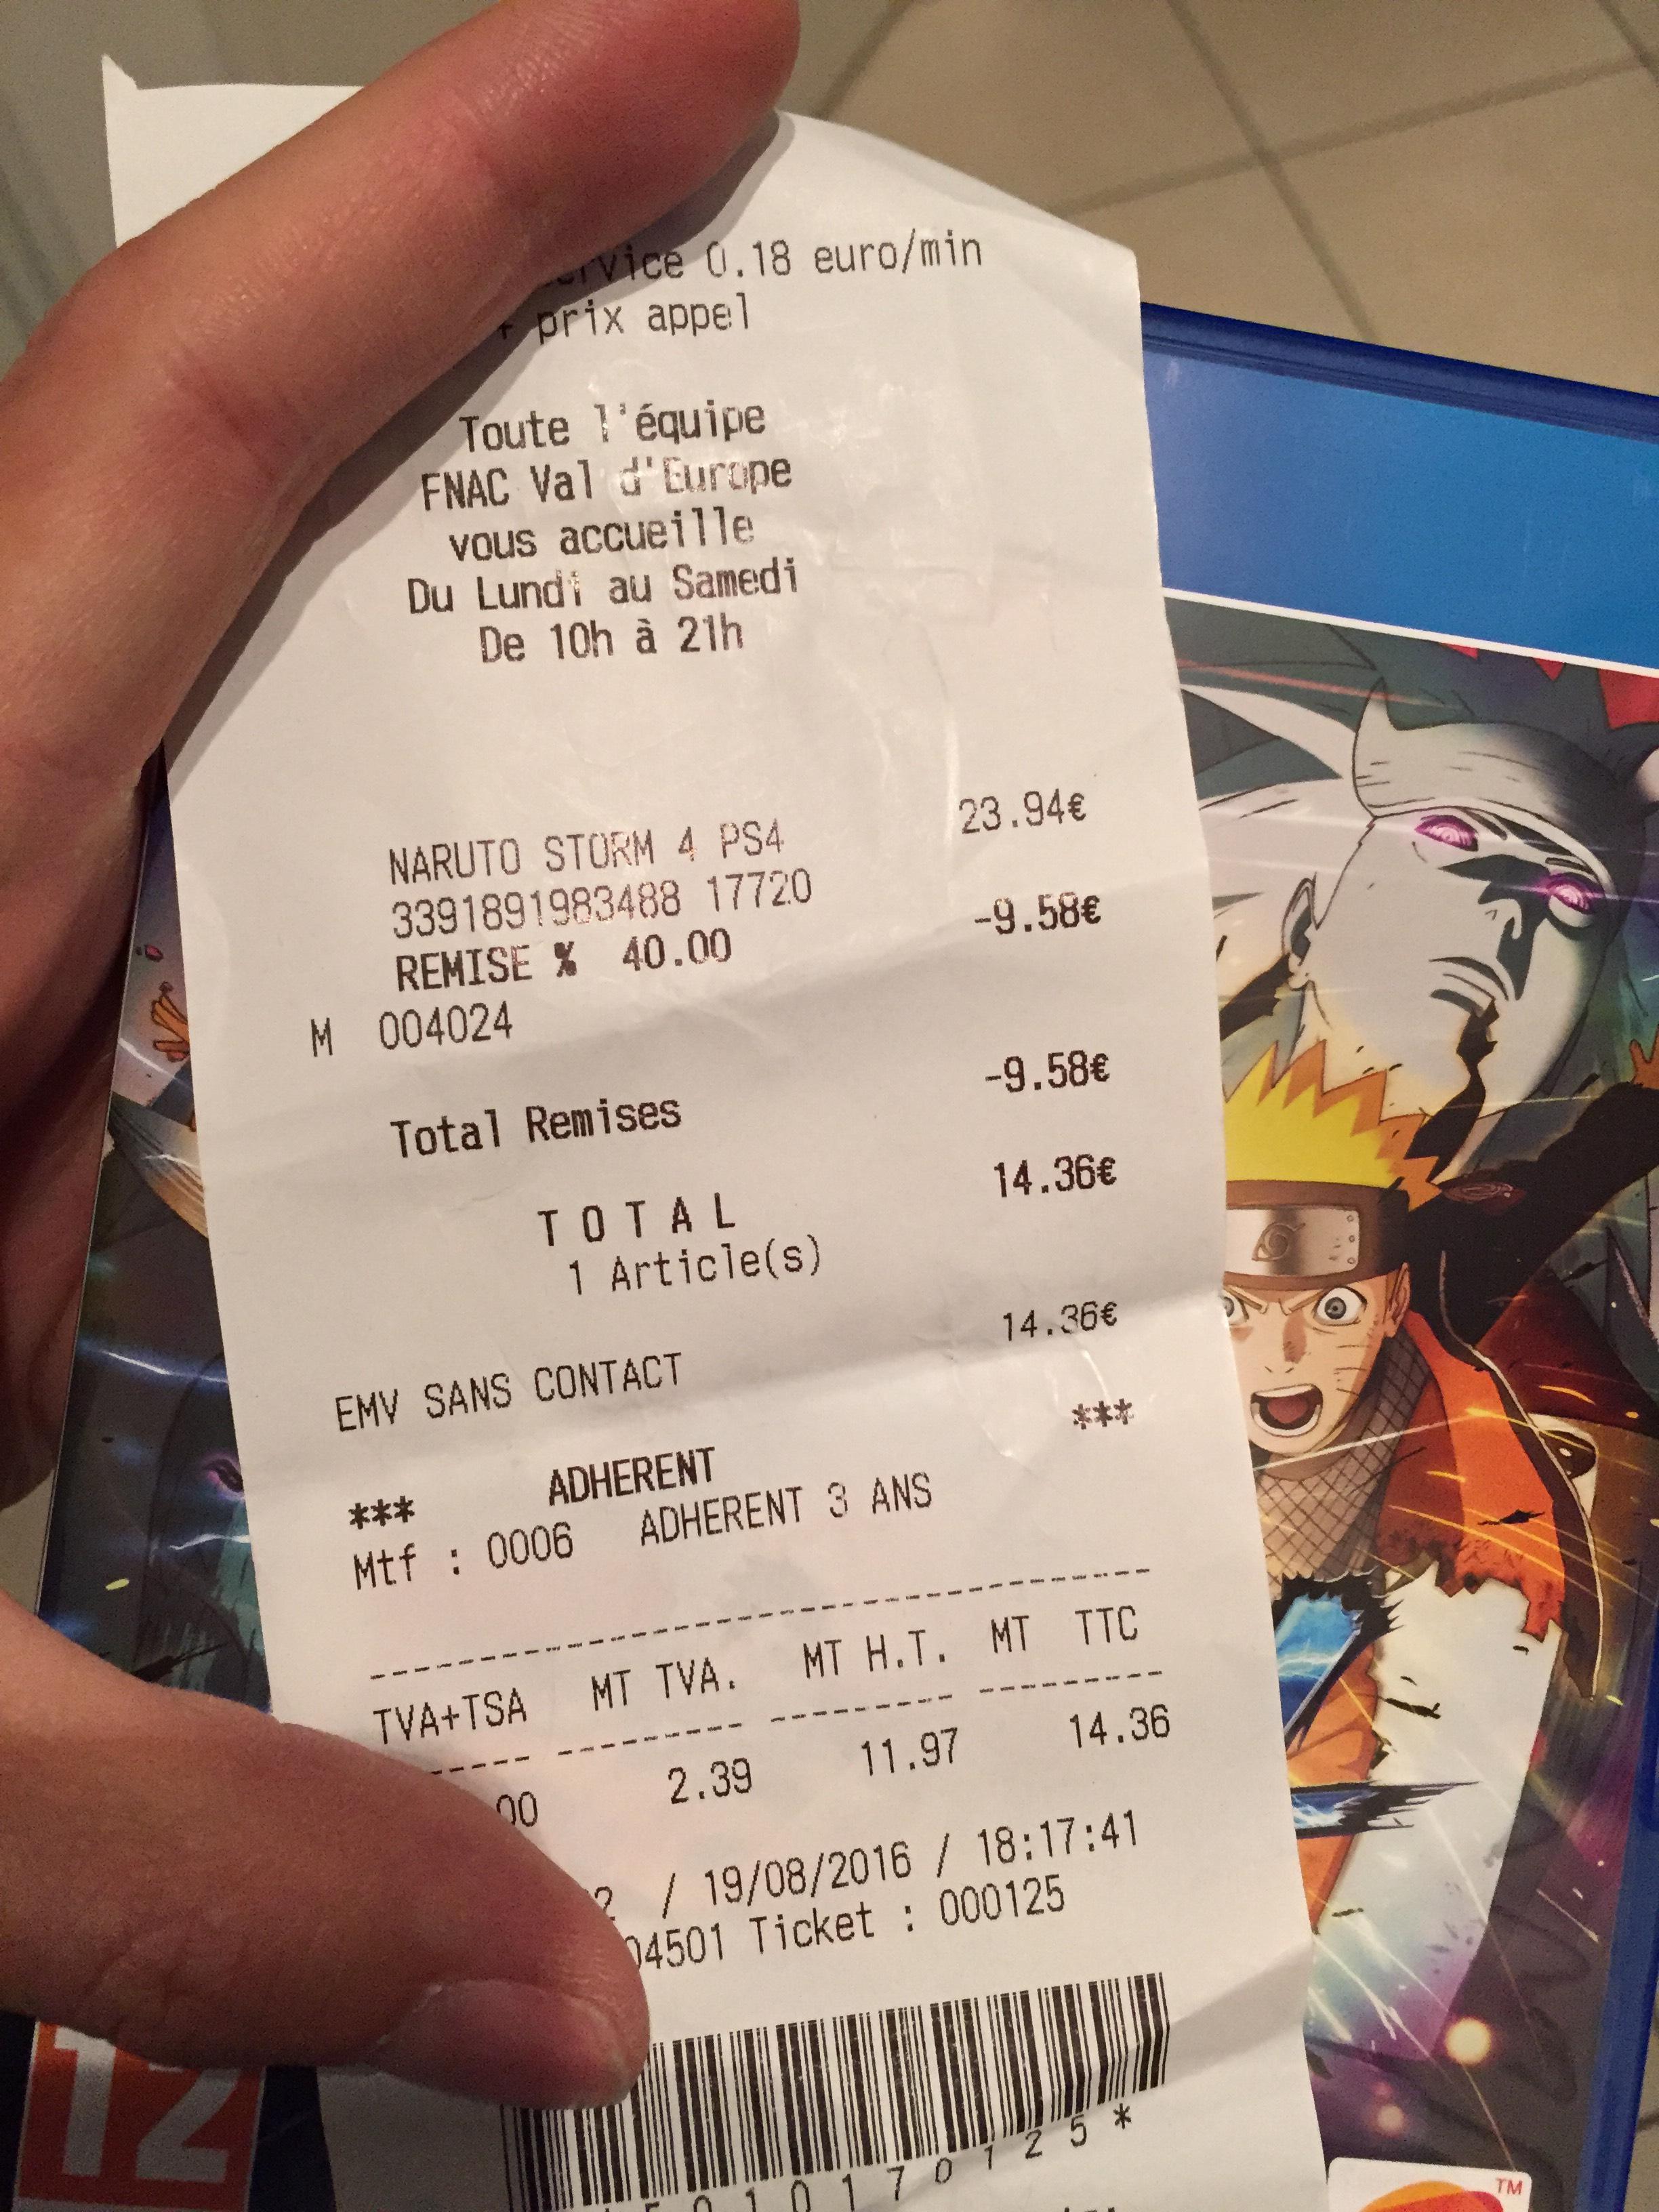 Naruto Ninja Storm 4 PS4 / Xbox One